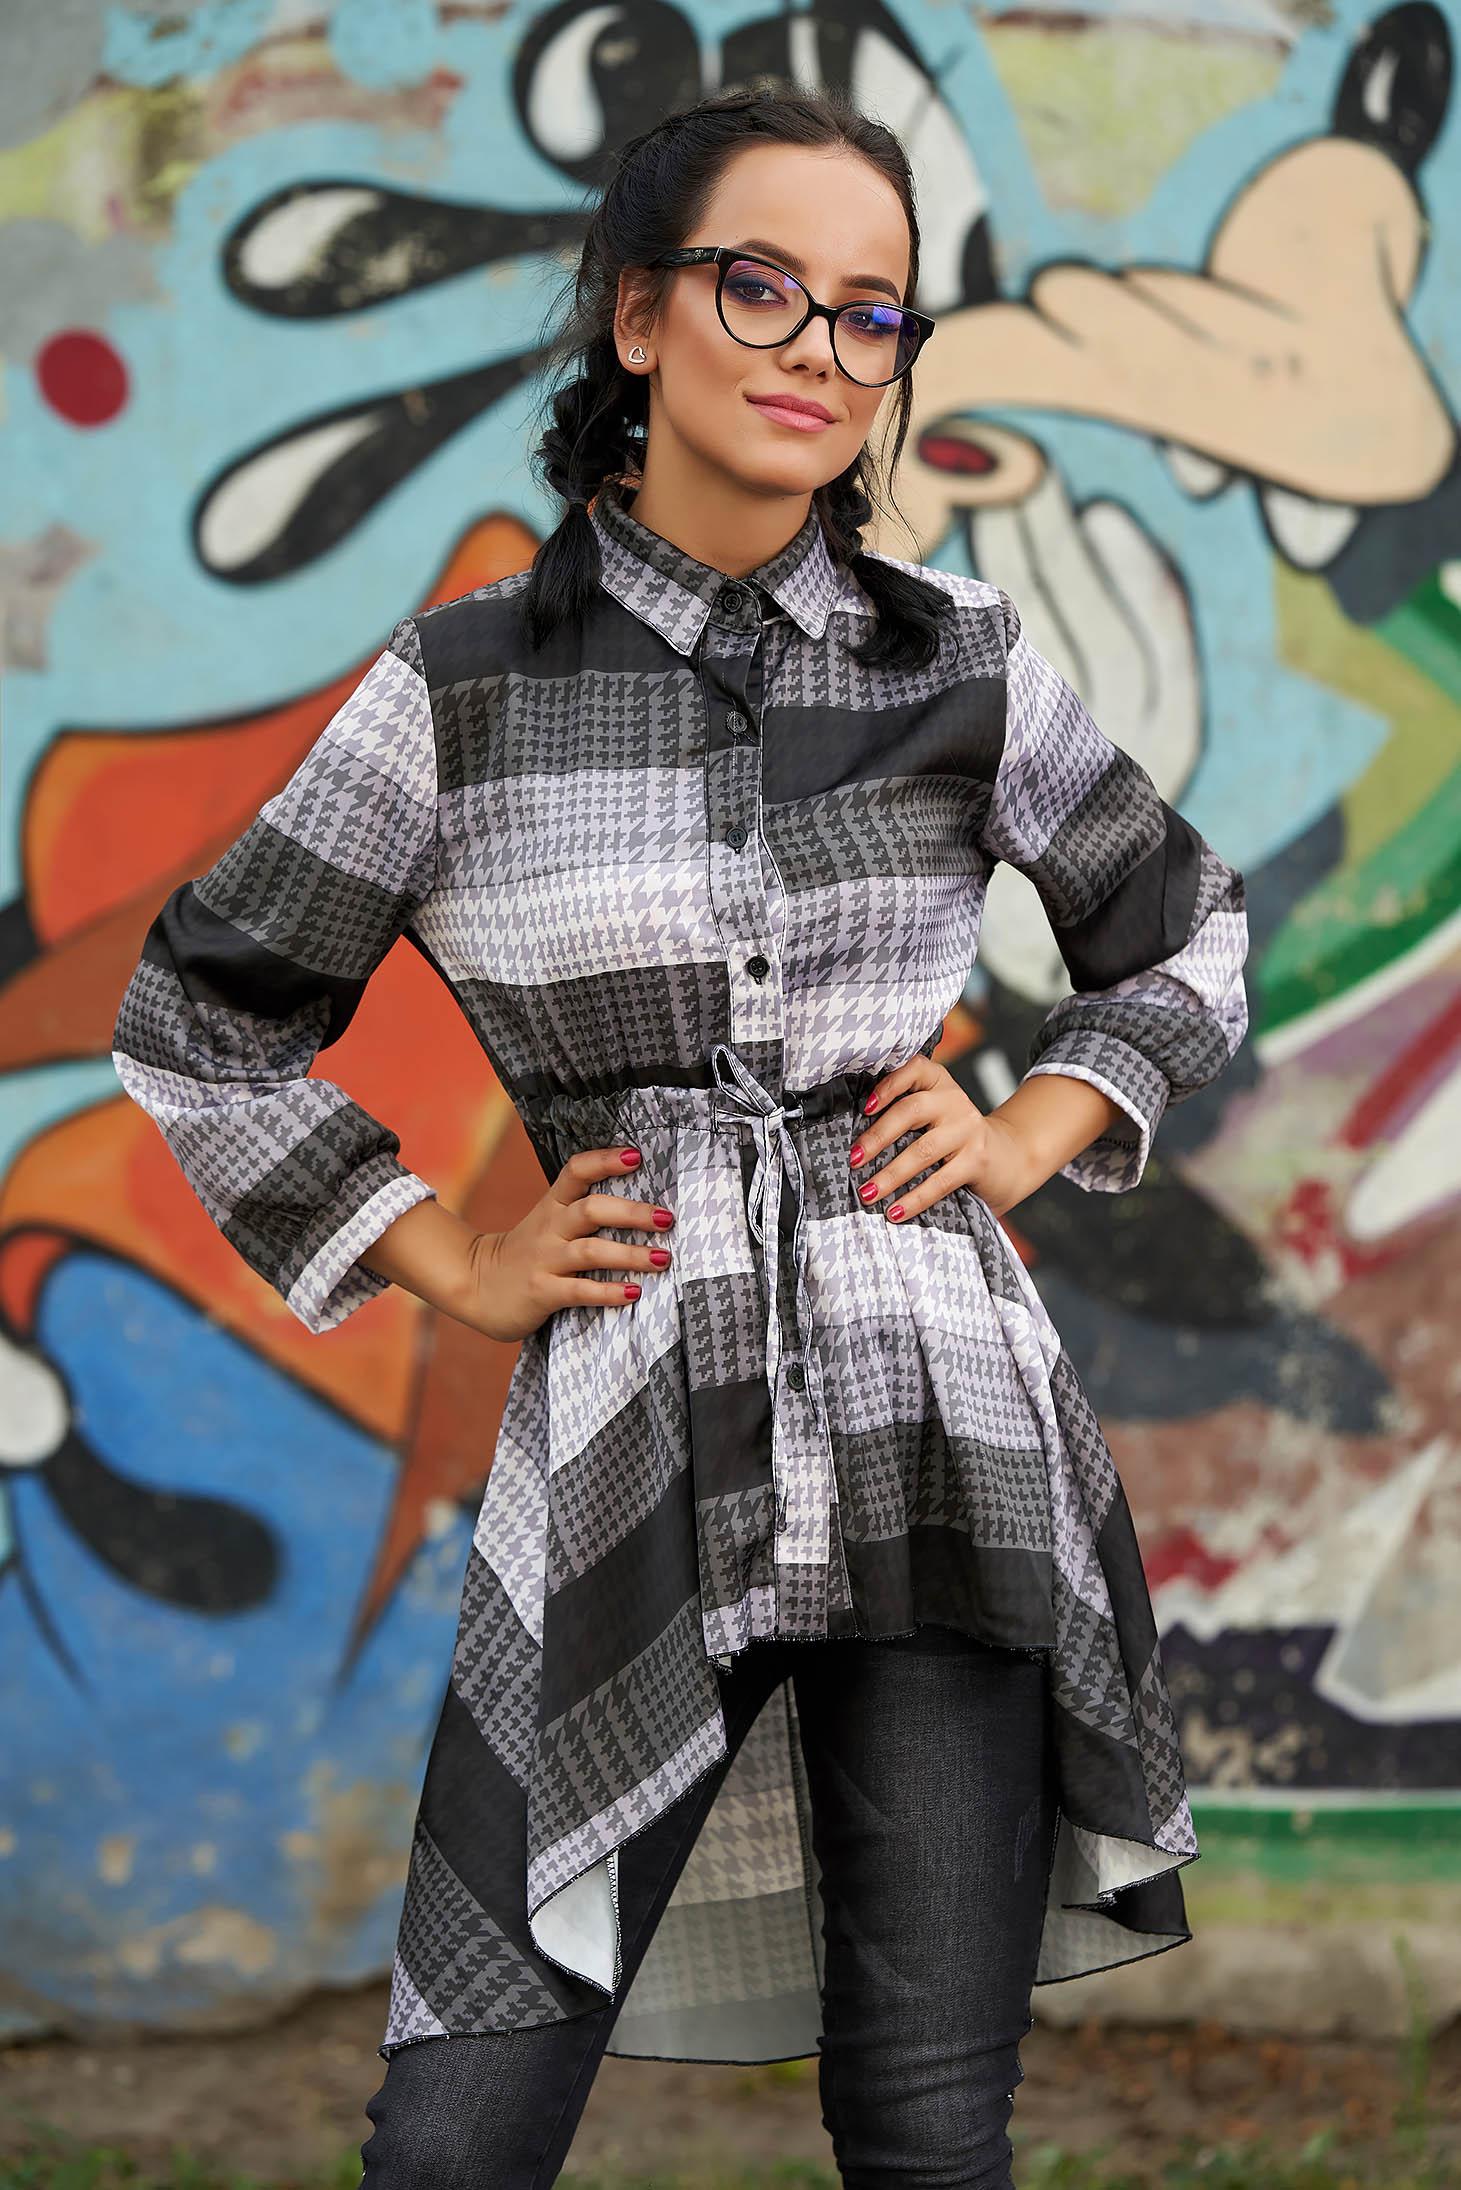 Bluza dama SunShine neagra casual de zi asimetrica cu maneci lungi cu snur in talie si imprimeuri grafice